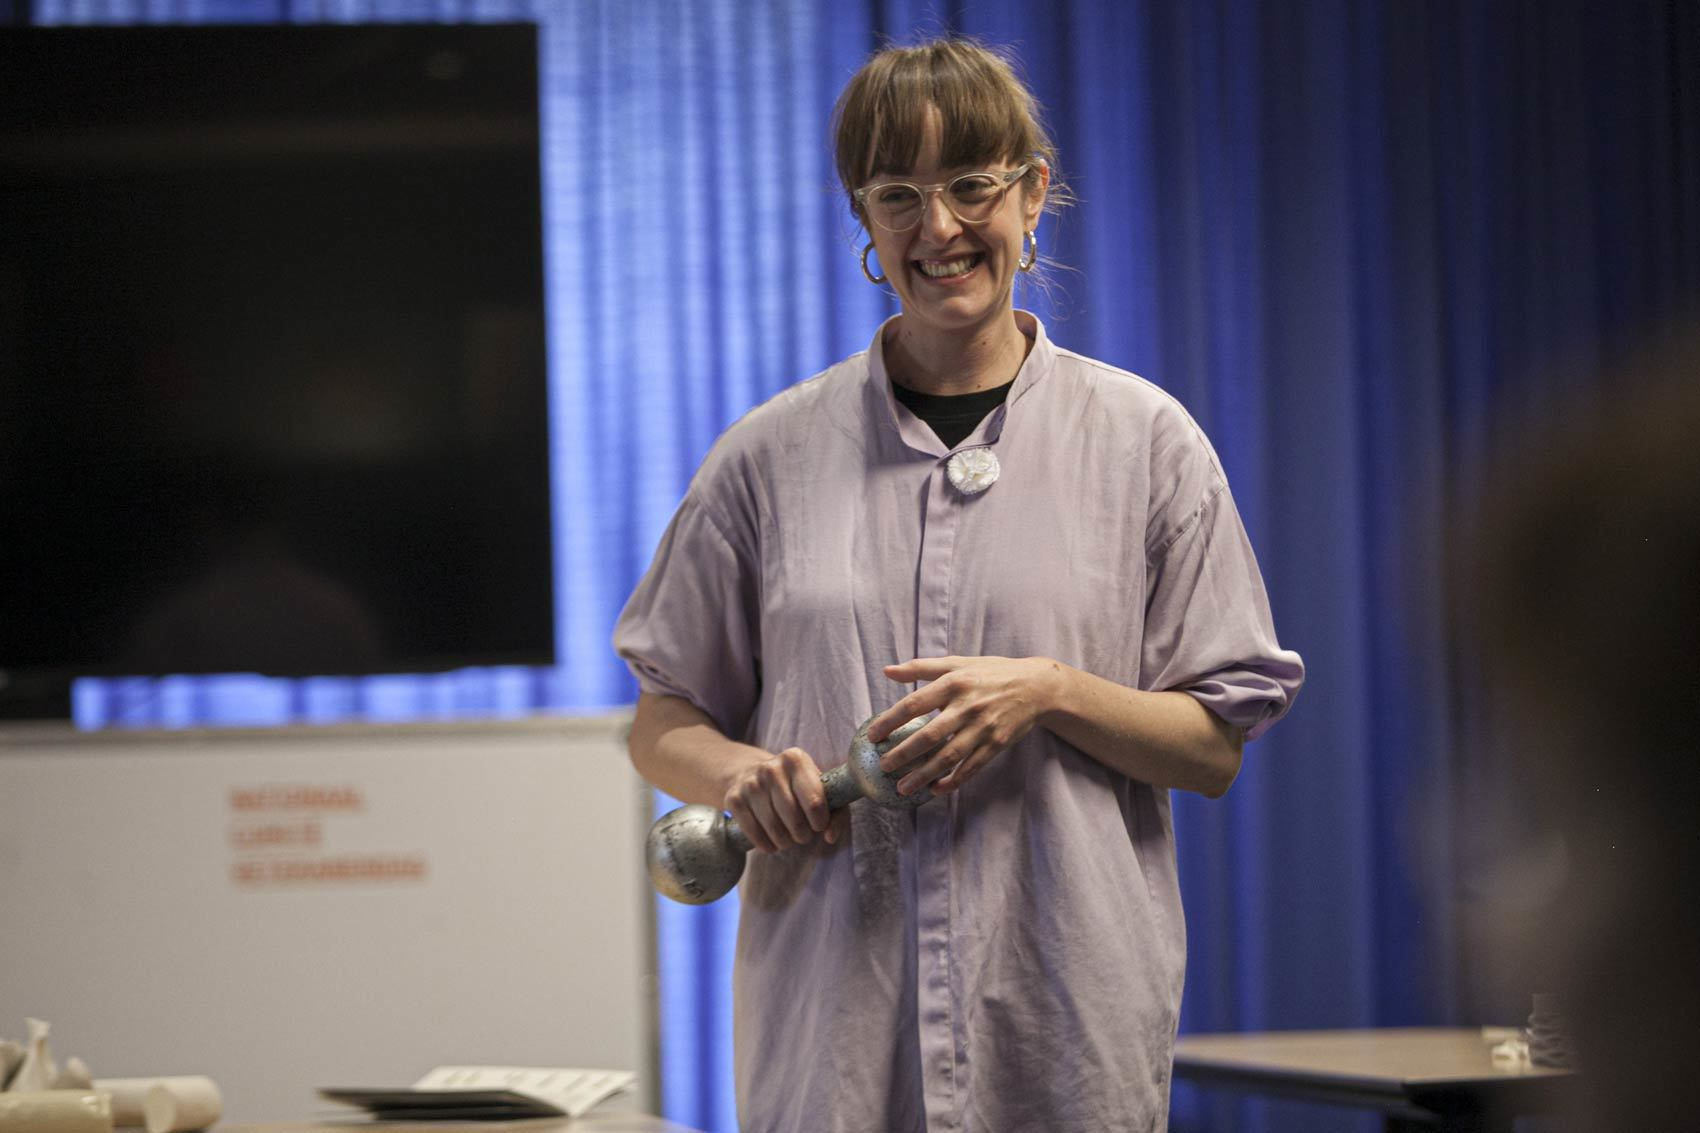 Zsofia Kollar - Witte Anjer Prijs ontwerpconcept 2020